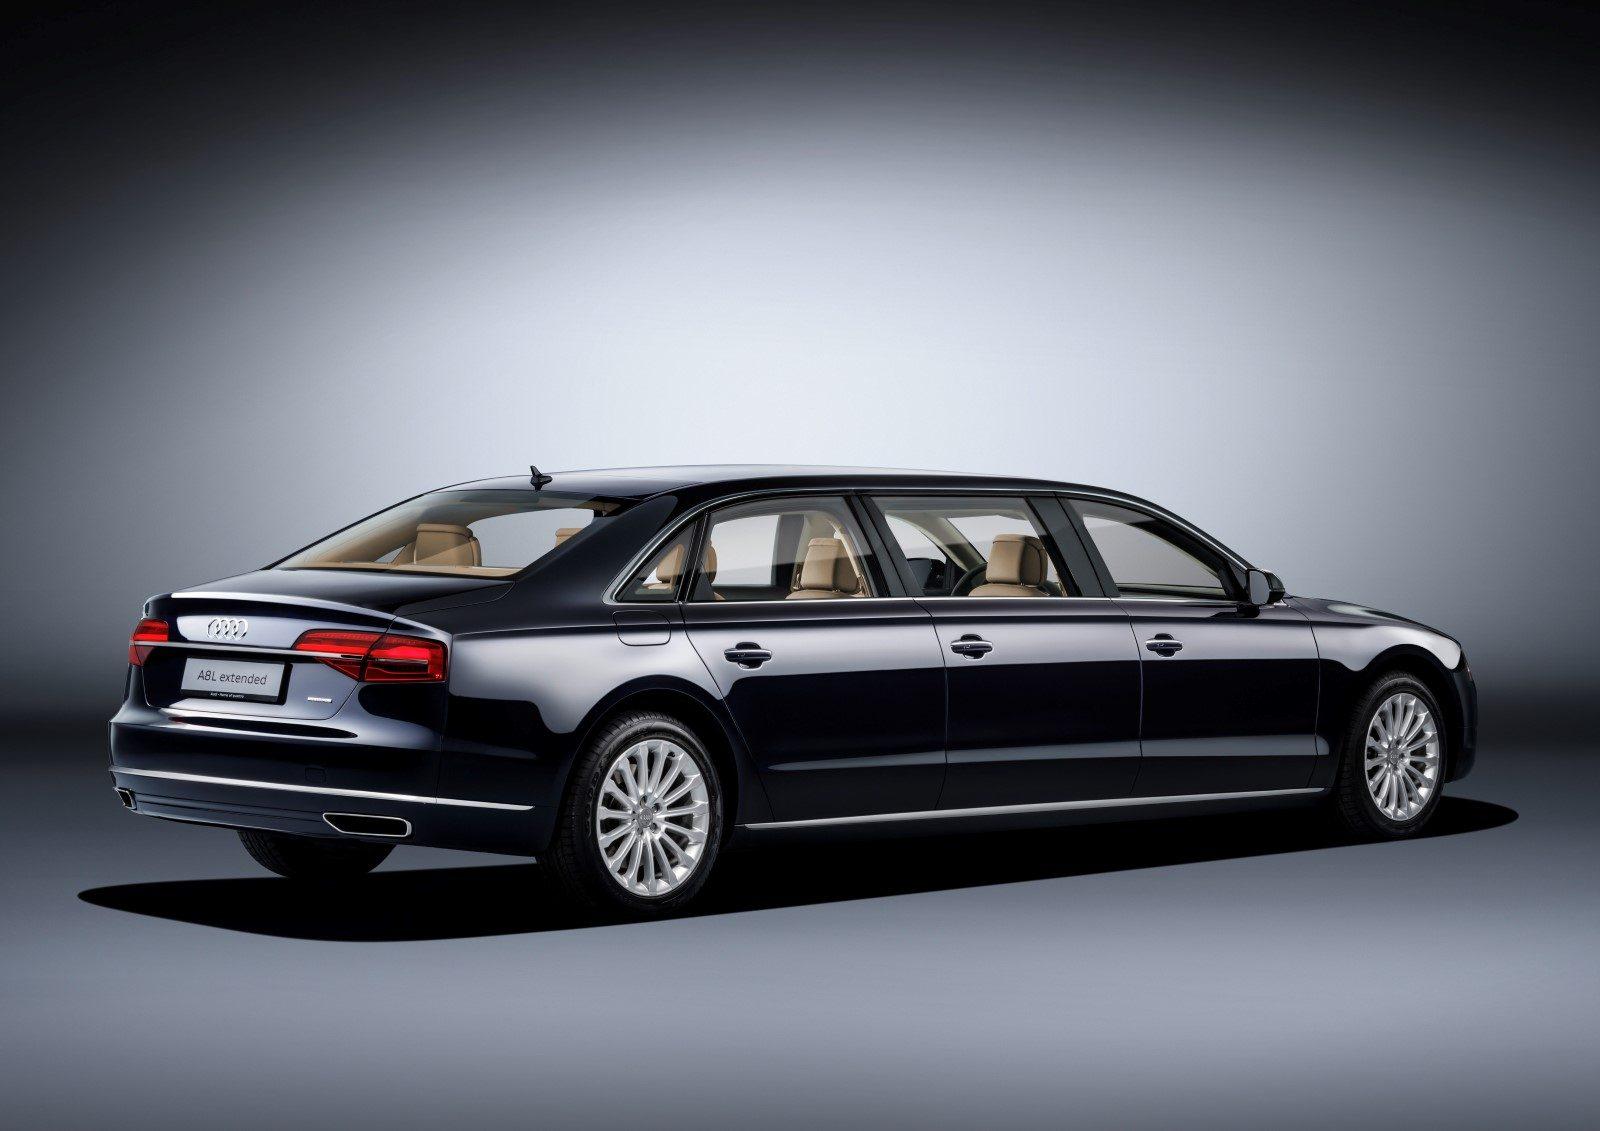 Audi-A8L-Extended-001.jpg